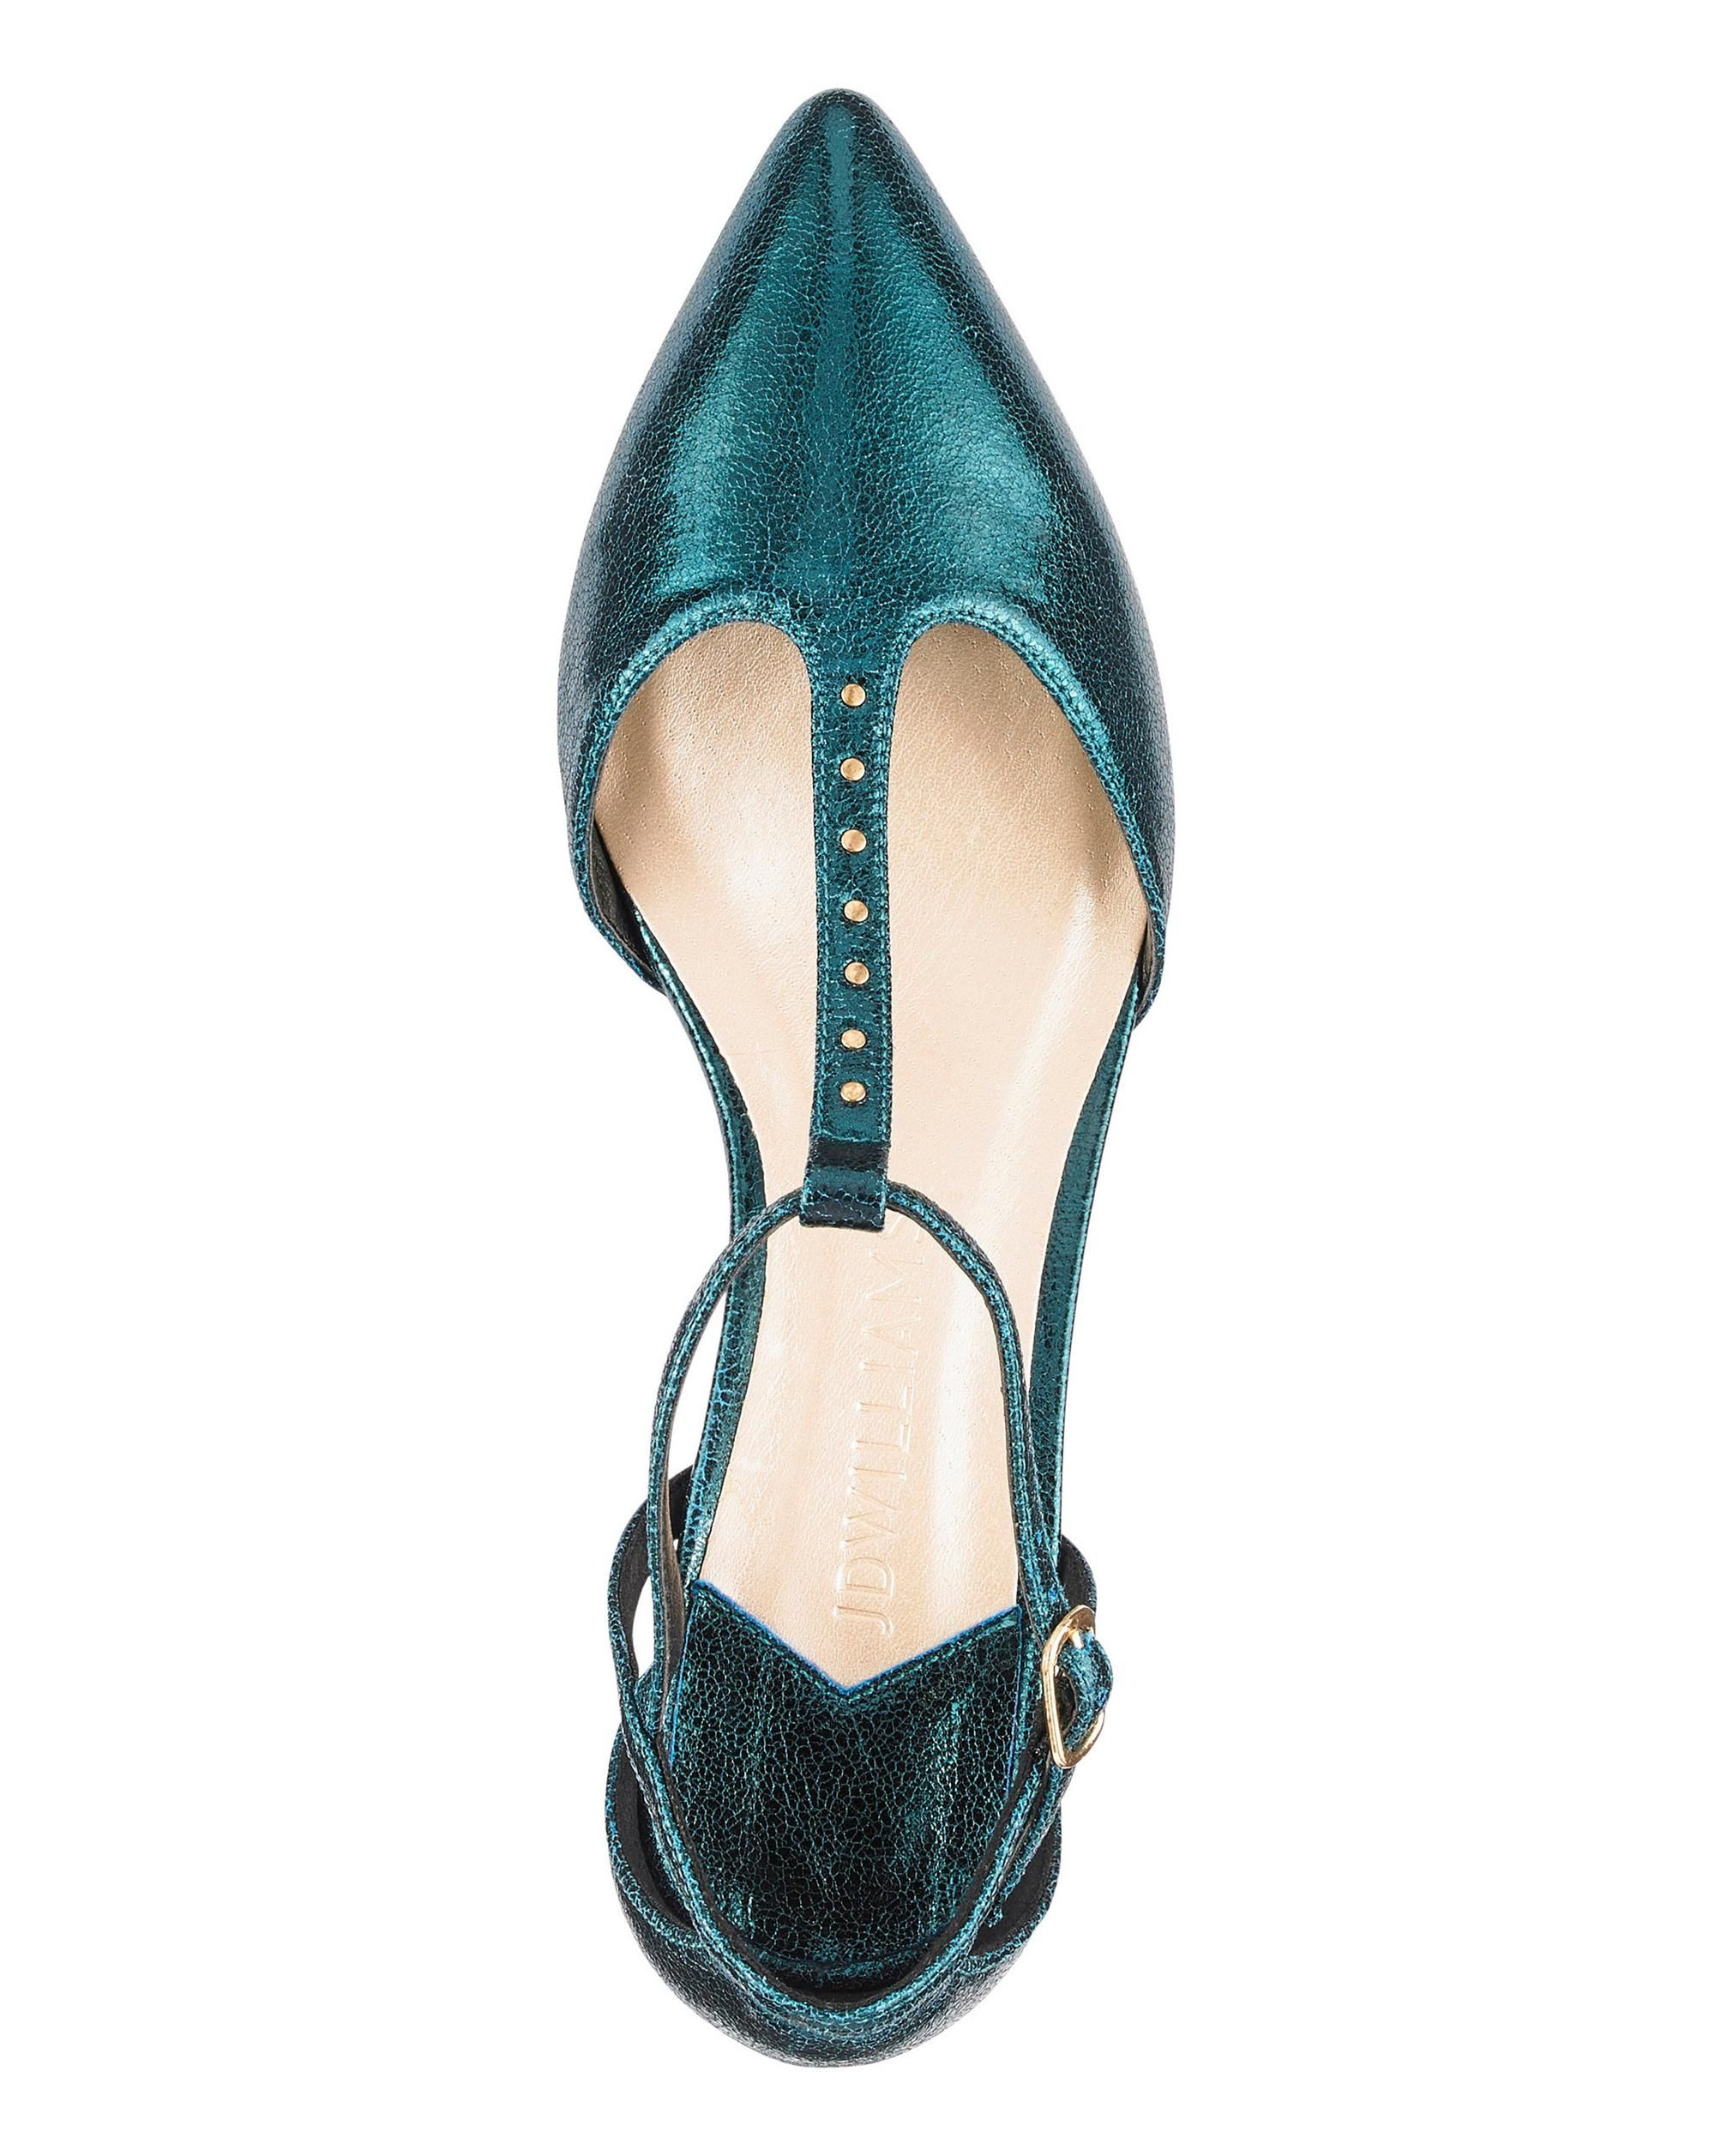 T Strap Kitten Heels Kitten Heels Wedding Shoes Online Wedding Shoes